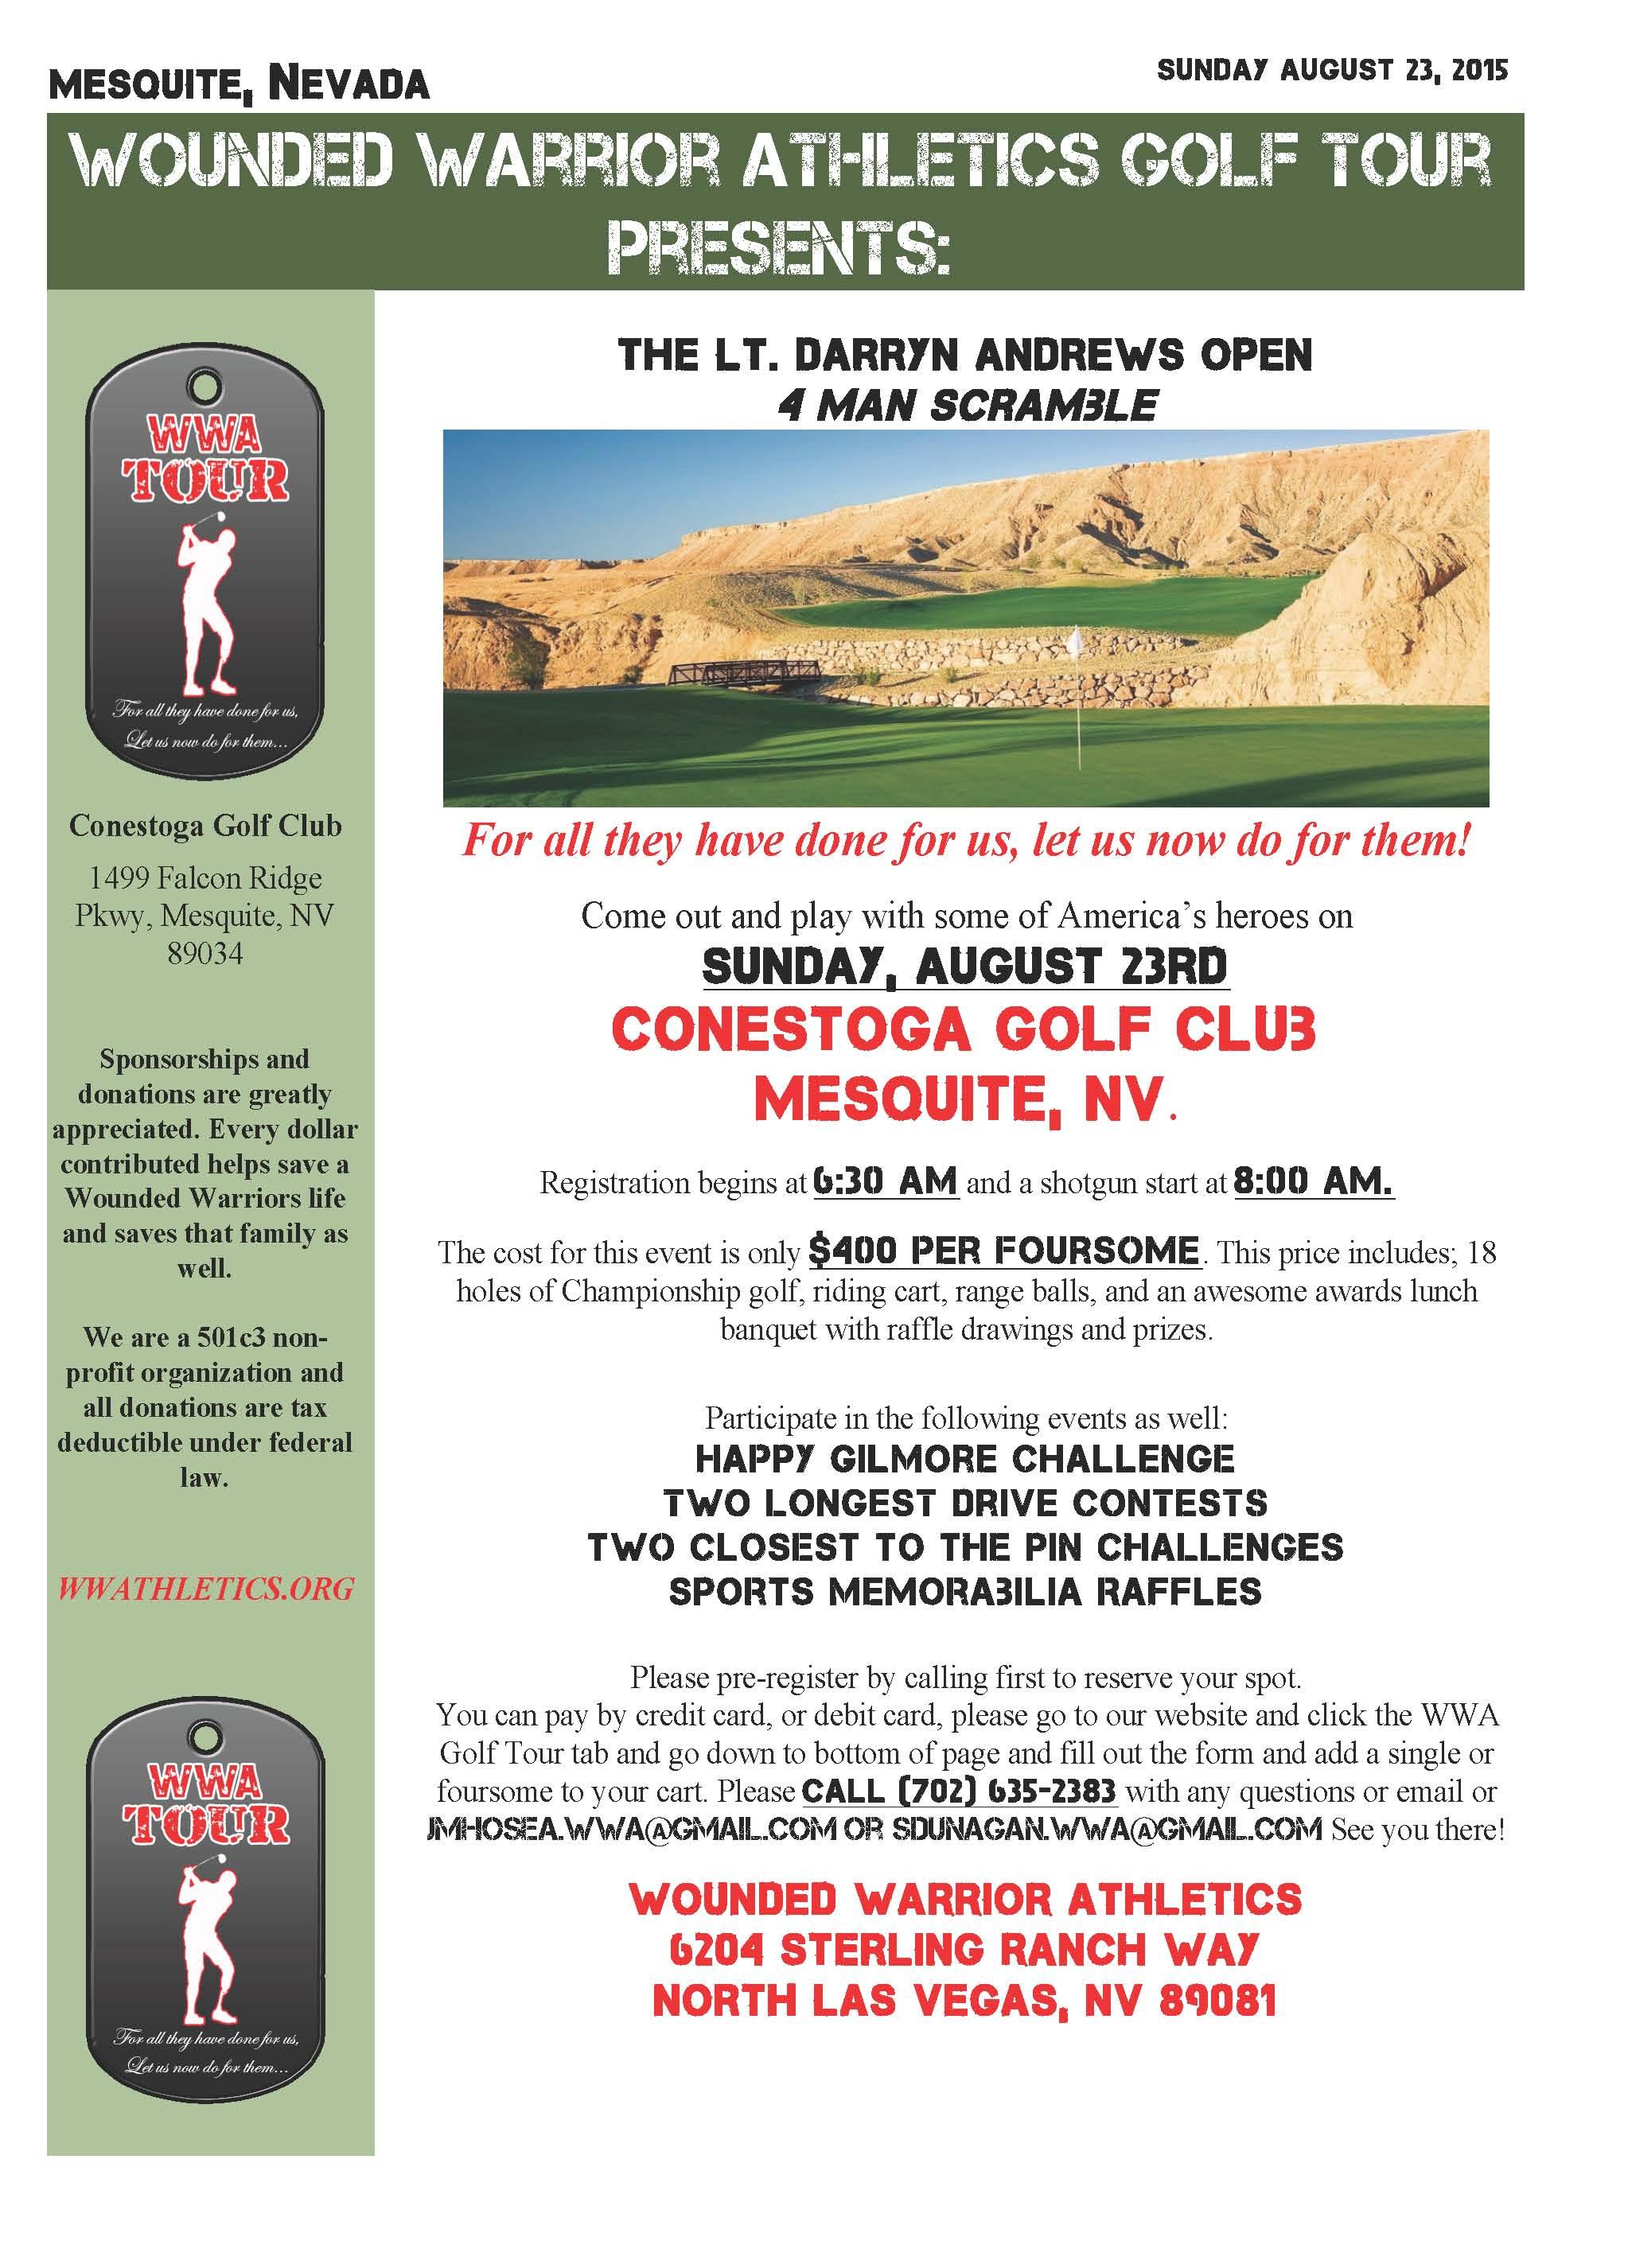 The LT. Darryn Andrews Open Golf Tournament in Mesquite